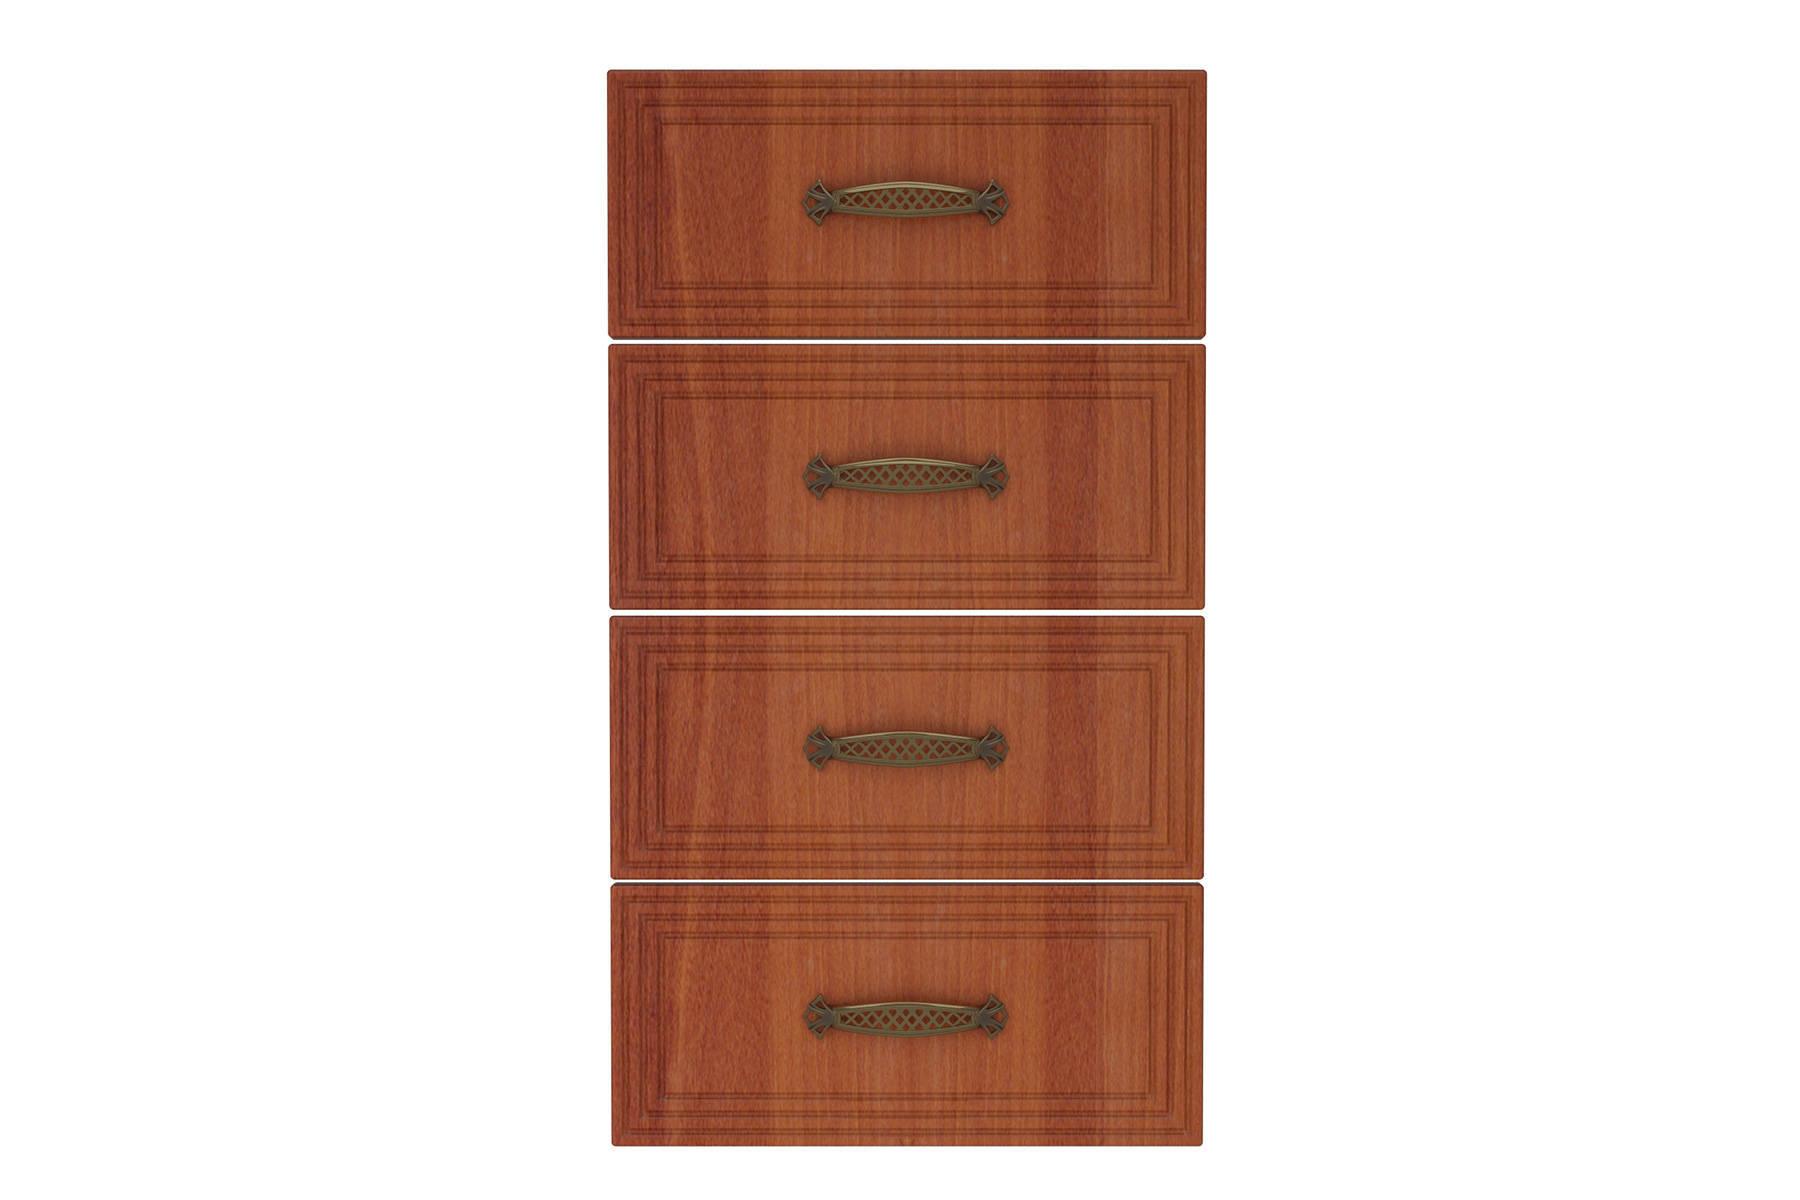 Фасад (ФТЯ4-40) Ника для корпусов ТЯ4-40 Итальянский орех кухонный гарнитур столлайн ника итальянский орех к1